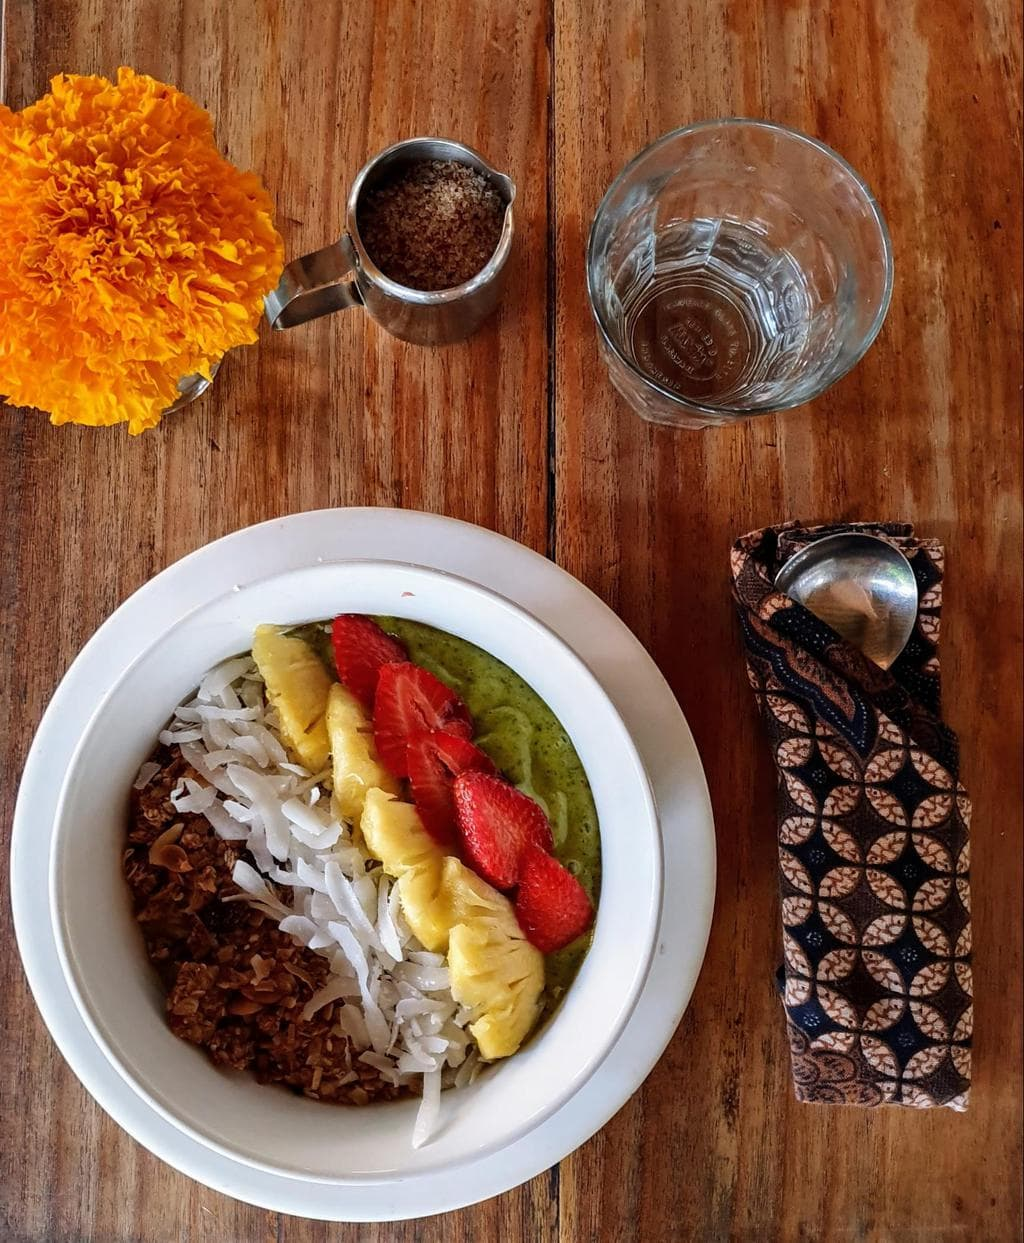 Bali Buda smoothie bowl